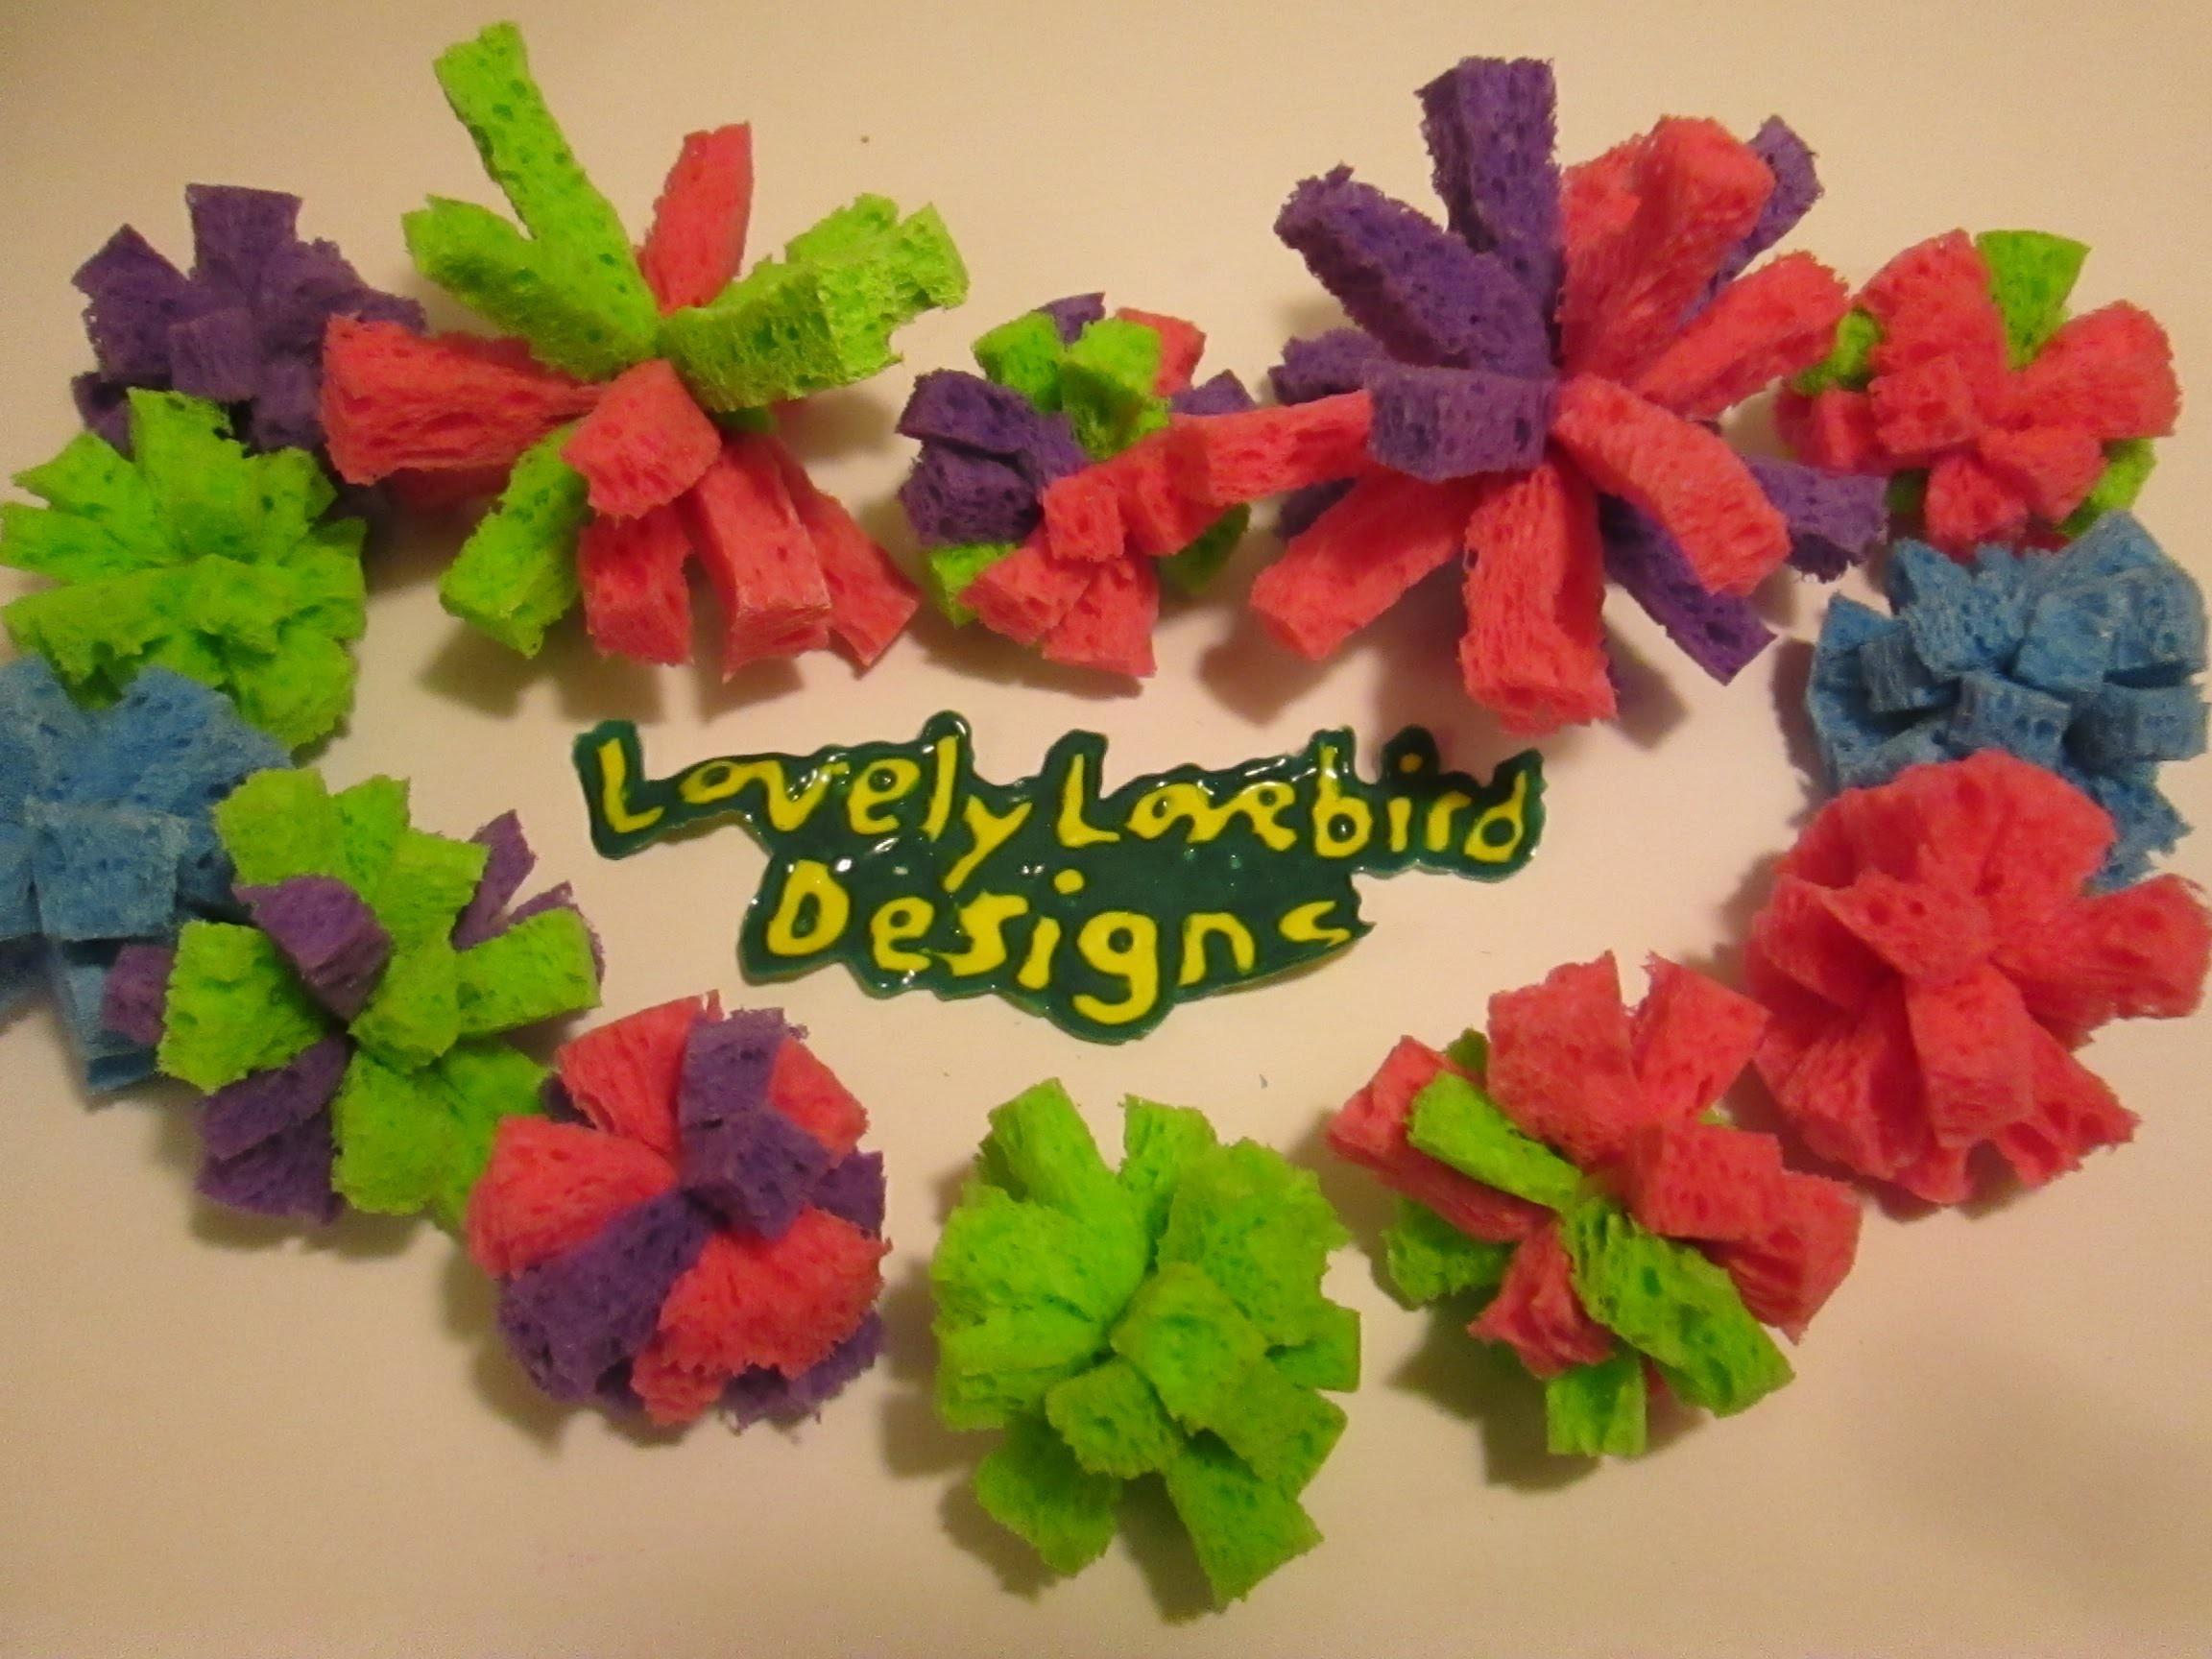 Diy Toy Sponge Pom Pom Ball Pencil Topper. Summer Crafts